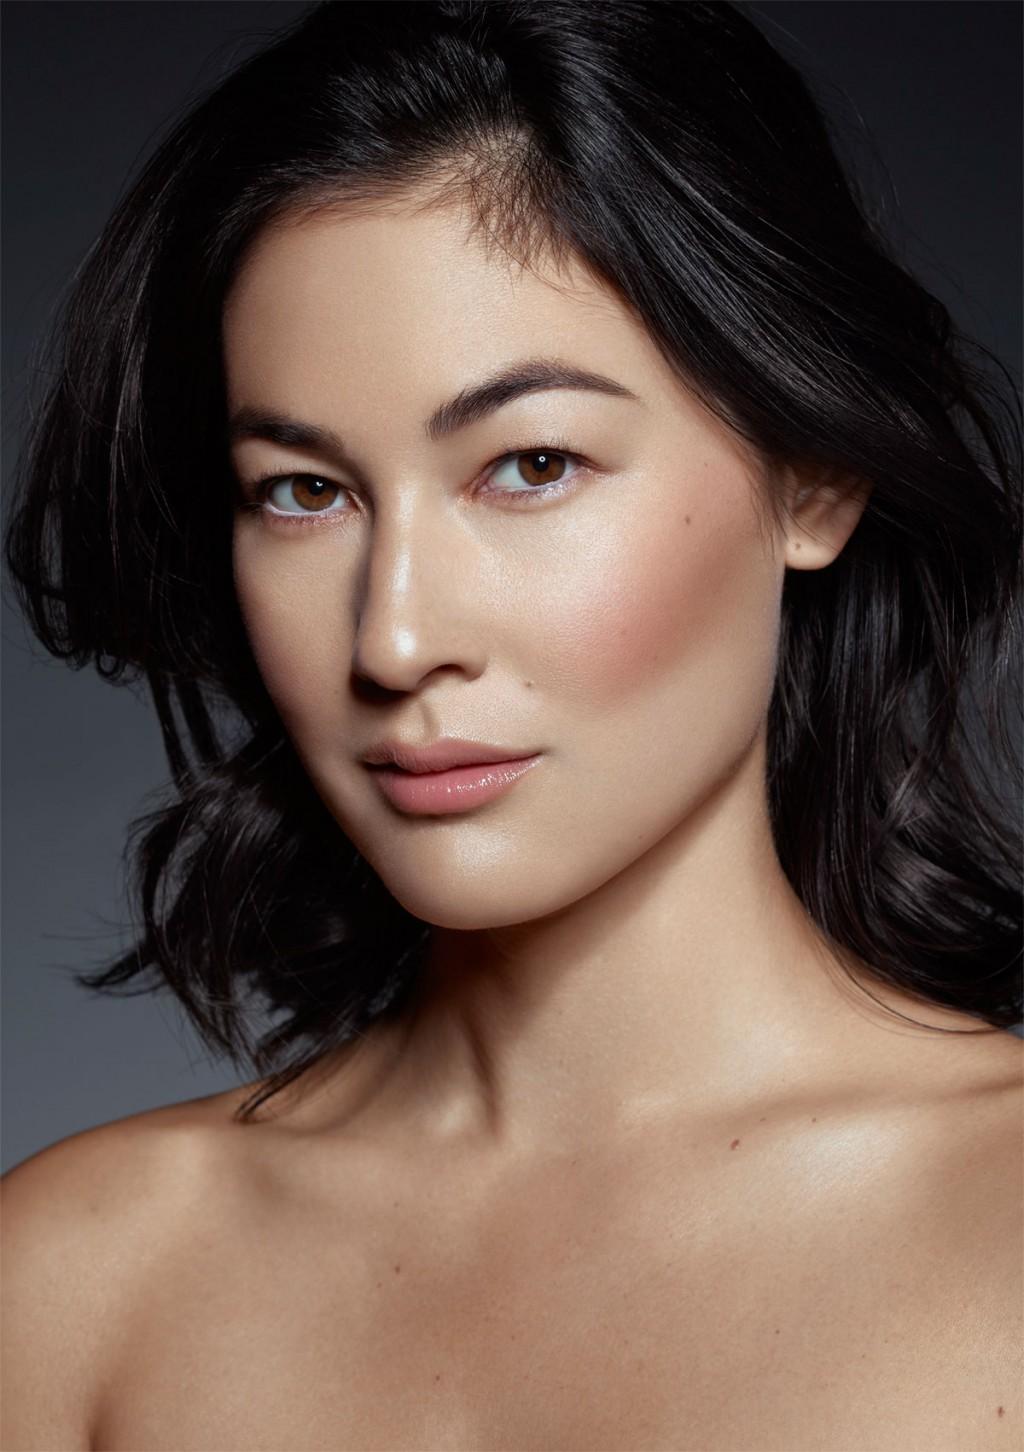 Model: Taylor of Osbrink Models, Makeup by Lupe Moreno, photo & post by Julia Kuzmenko McKim